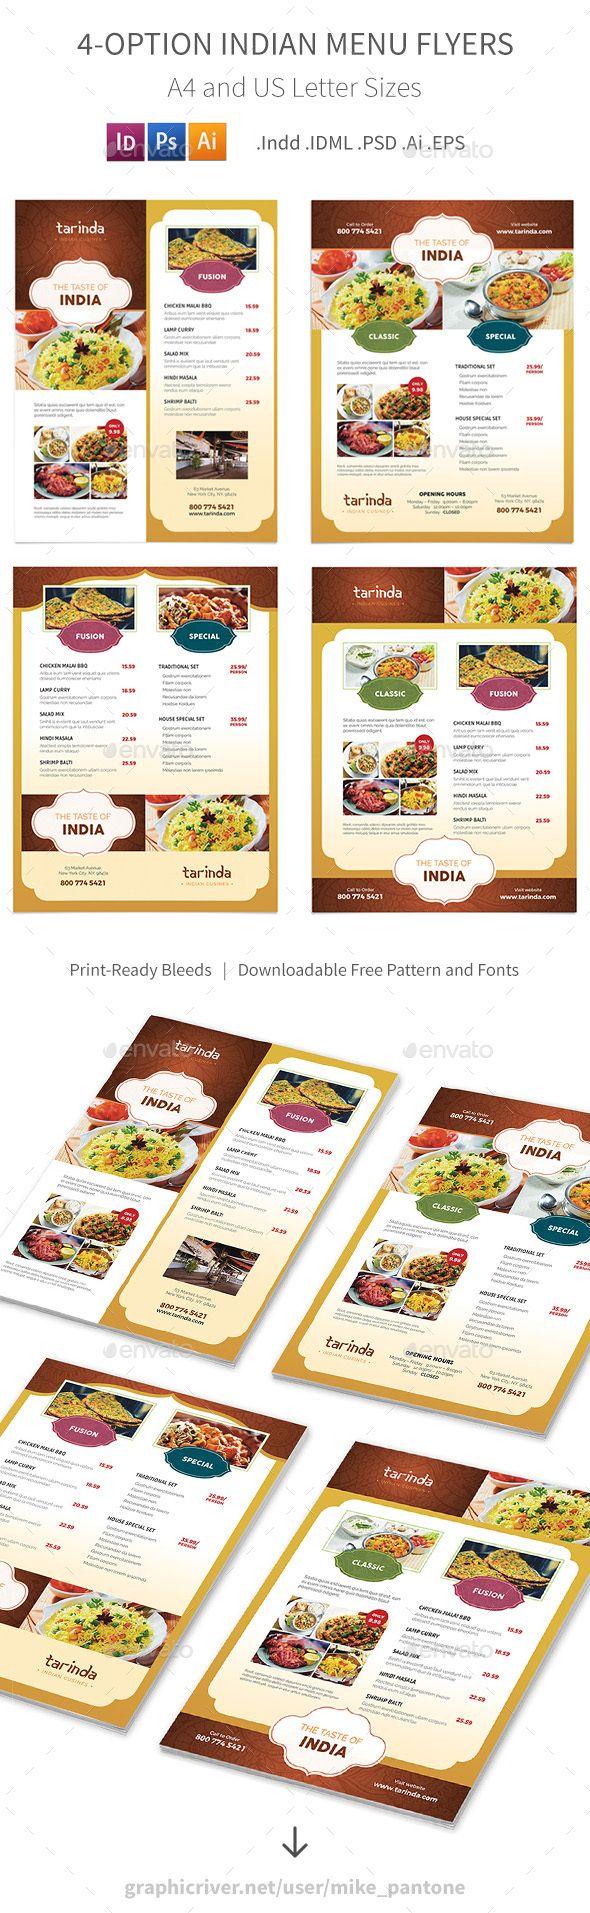 Indian Restaurant Menu Flyers – 4 Options | Food menu, Print ...